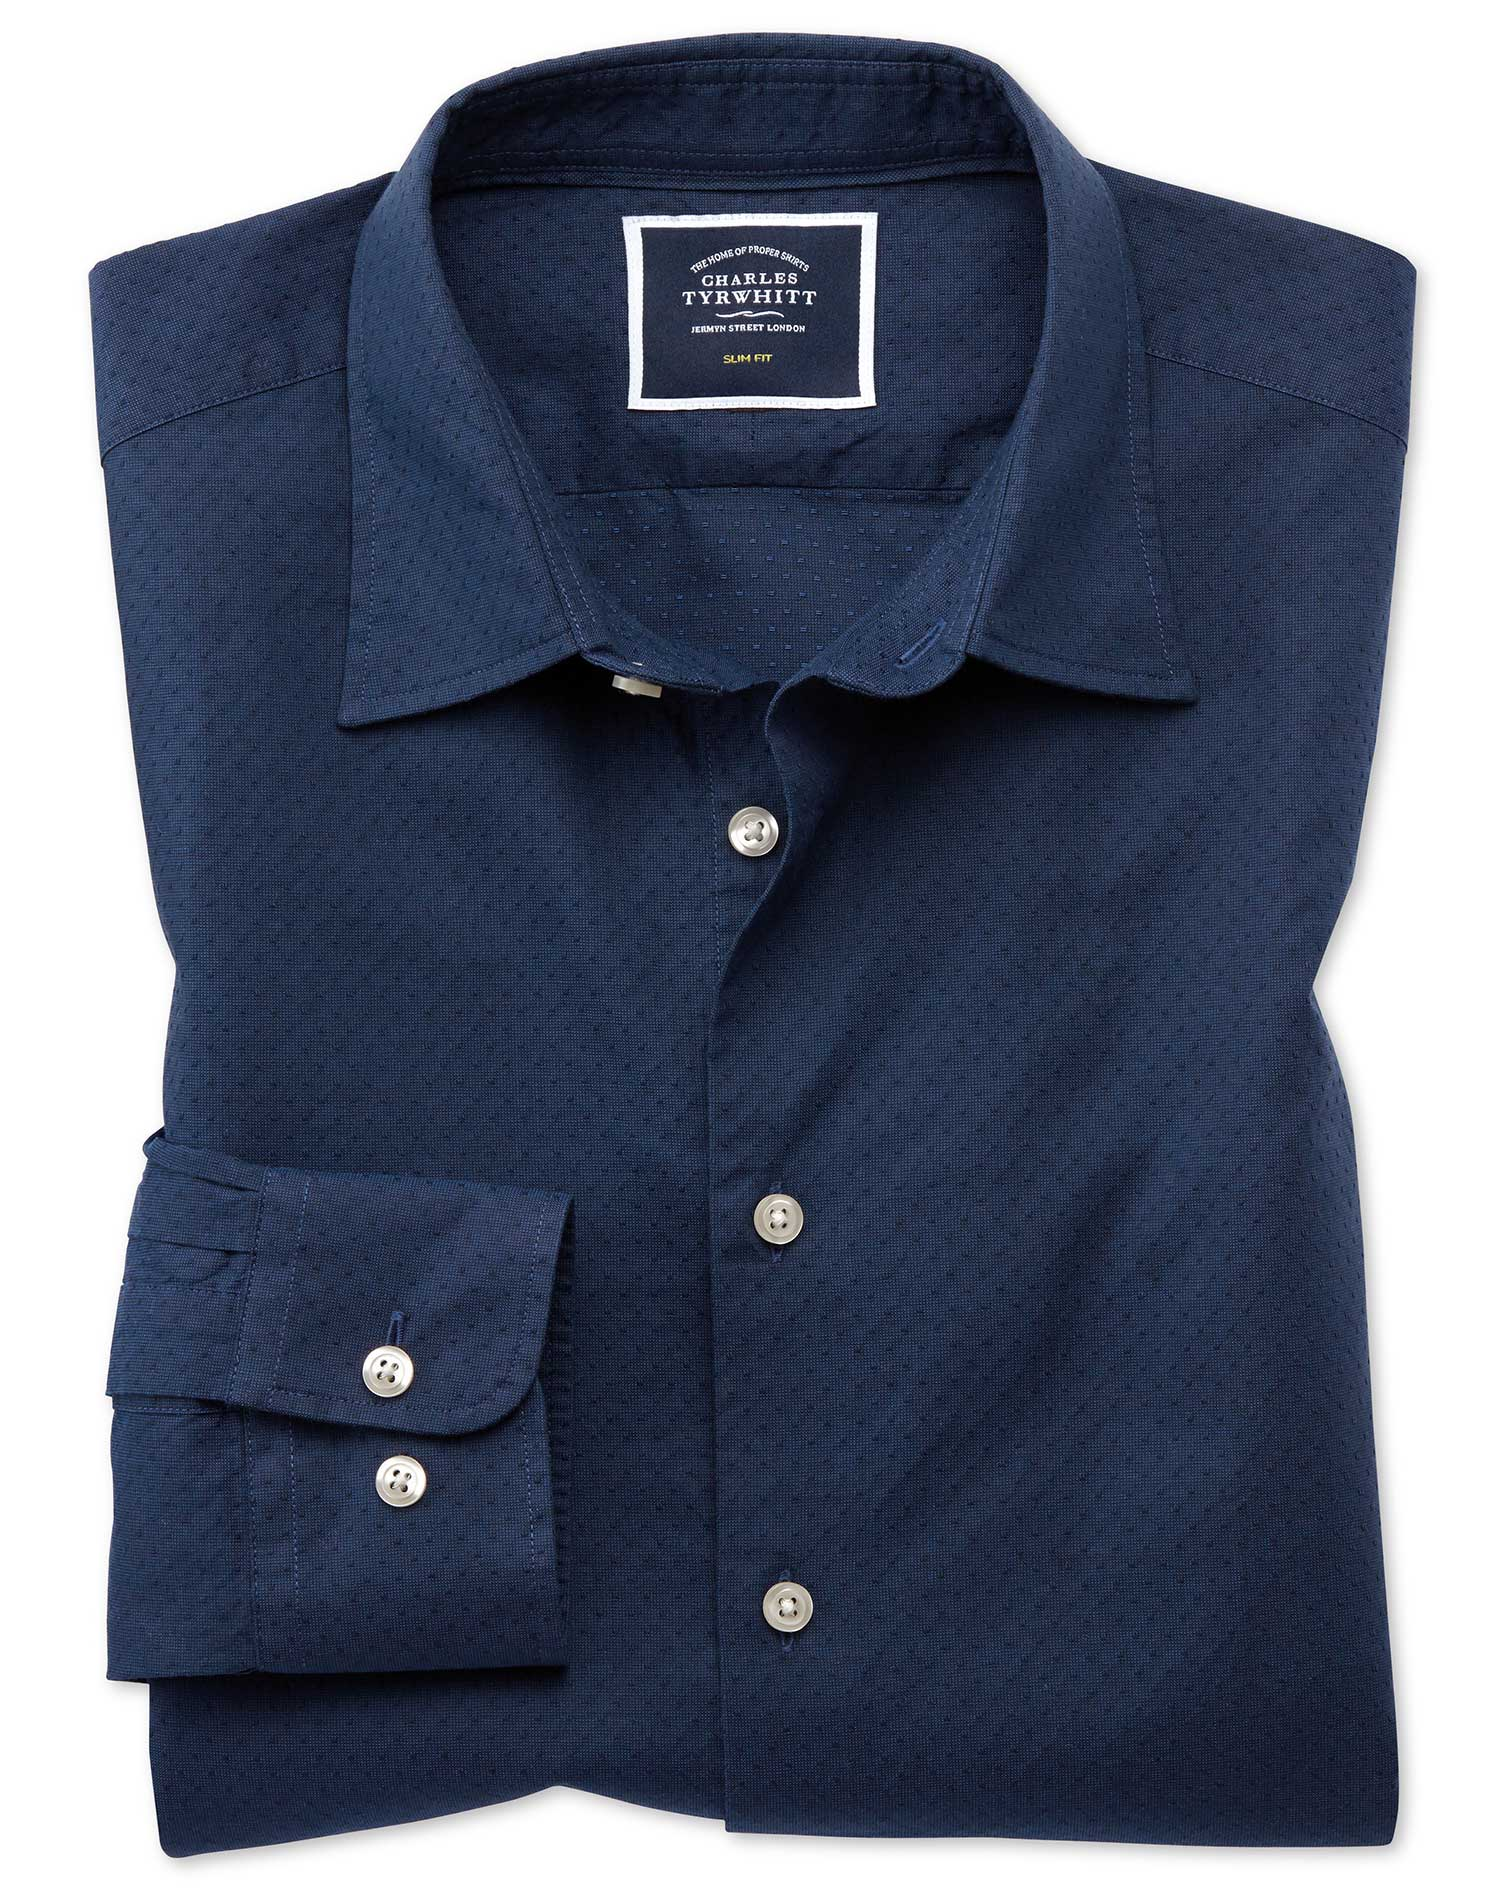 Classic Fit Dark Blue Spot Soft Texture Cotton Shirt Single Cuff Size Small by Charles Tyrwhitt